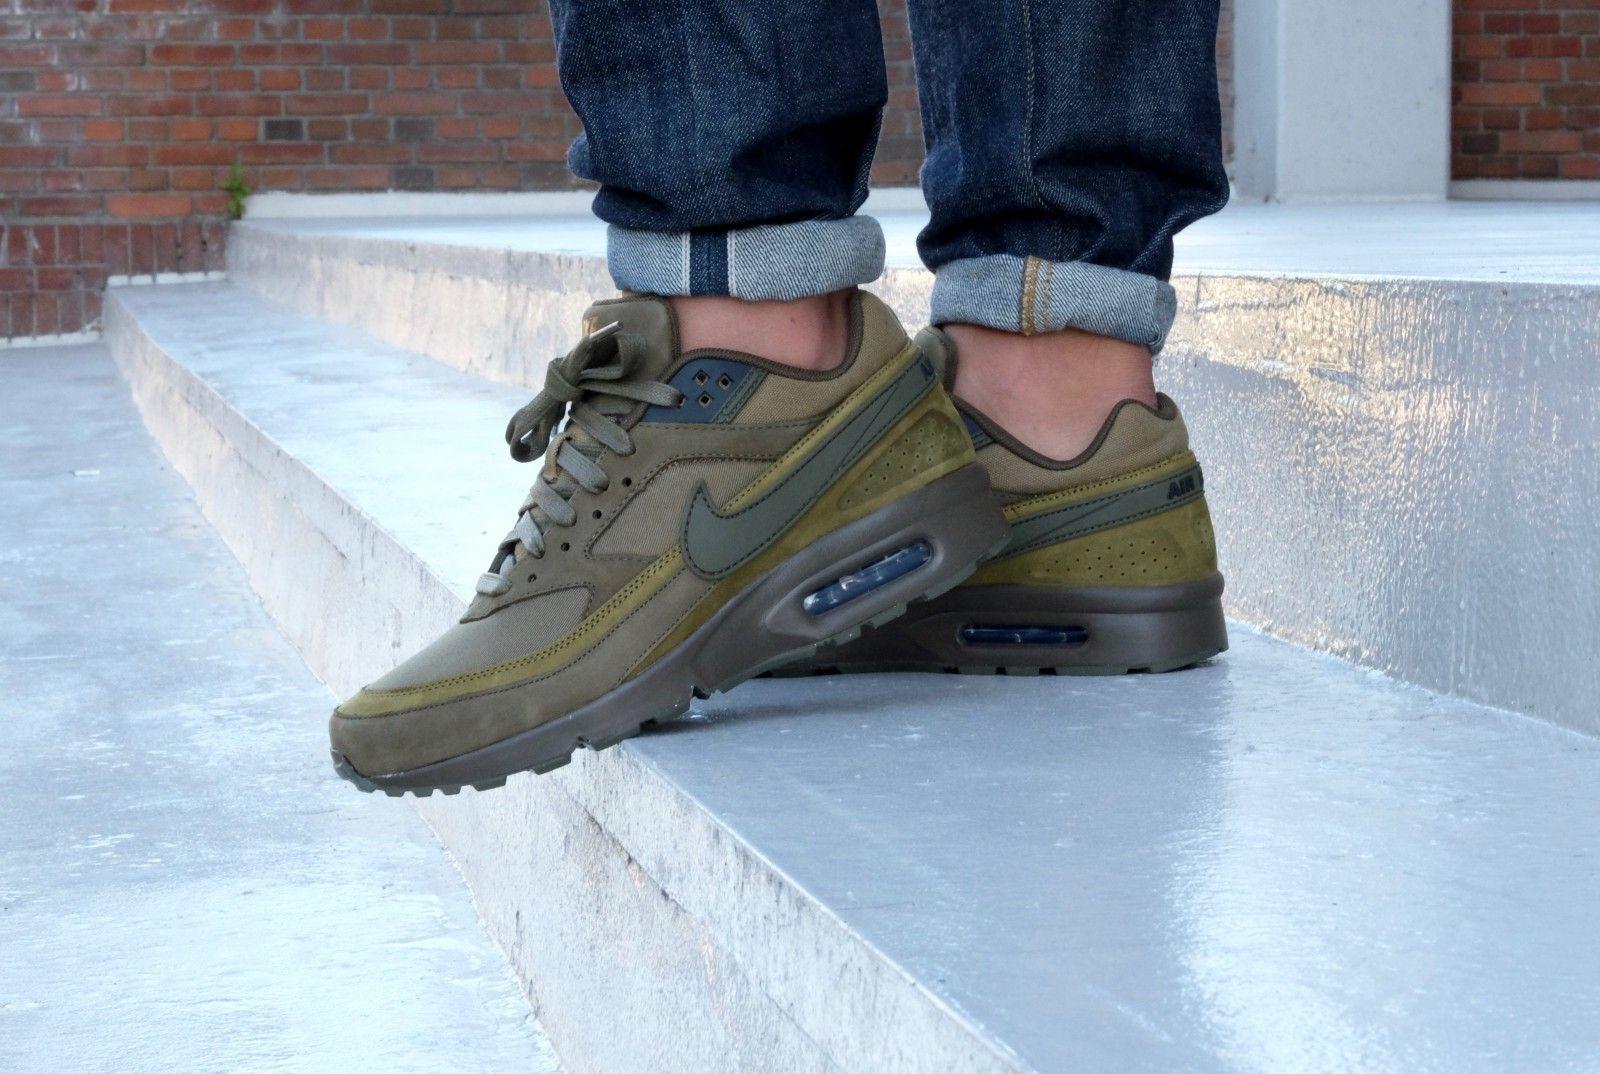 size 40 767de 027ec ... Nike Air max BW Premium Dark Loden-Olive Flak - 819523-300 ...